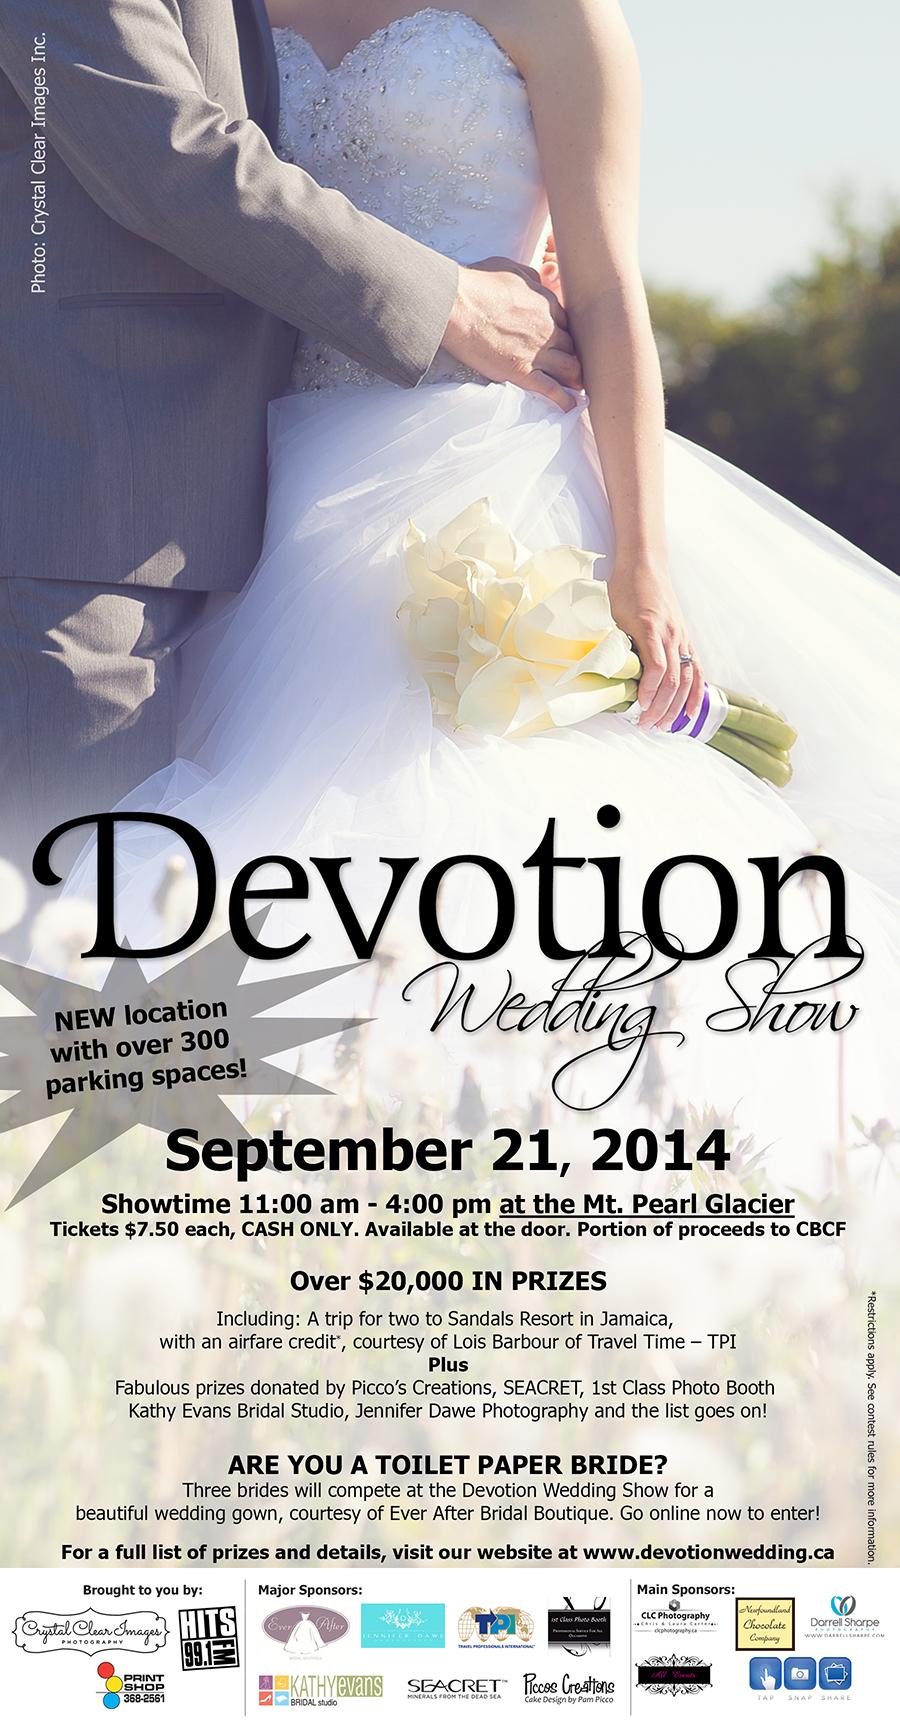 fall2014Poster Fall 2014 Devotion Wedding Show   Jennifer Dawe Photography